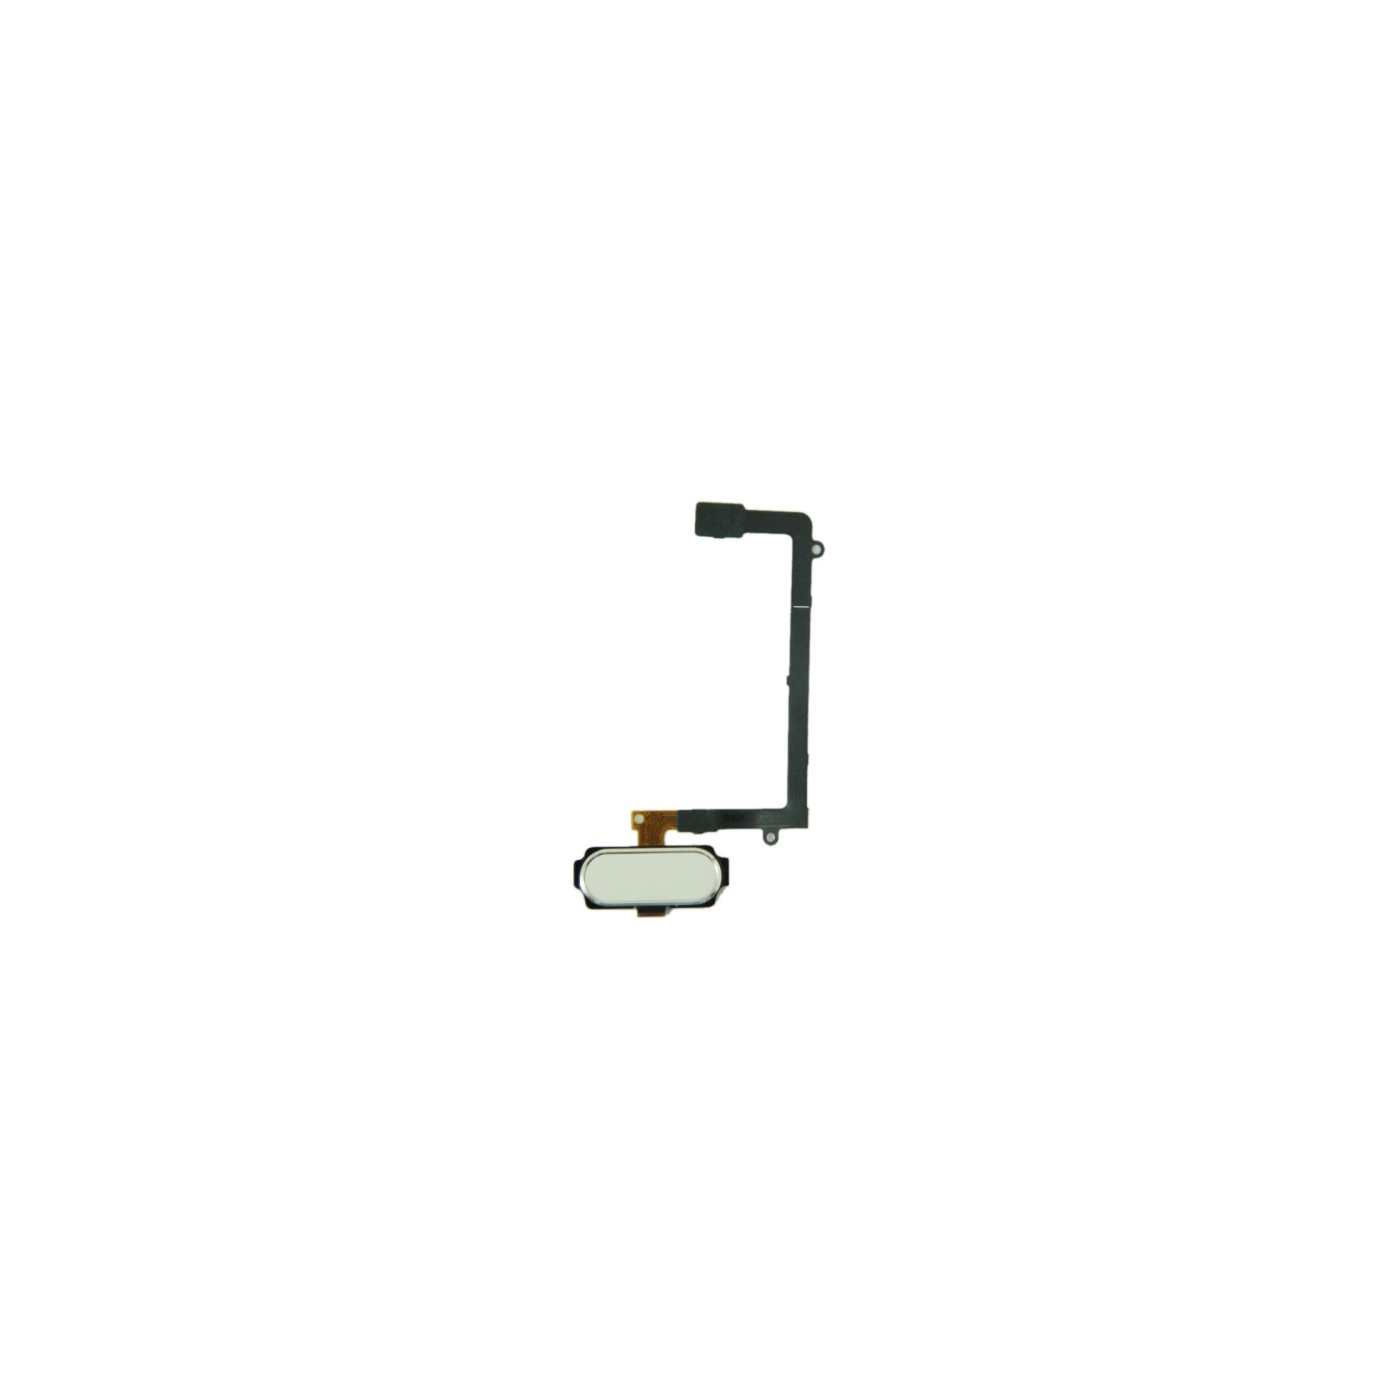 white home button key for samsung galaxy S6 Edge G925 central flat flex